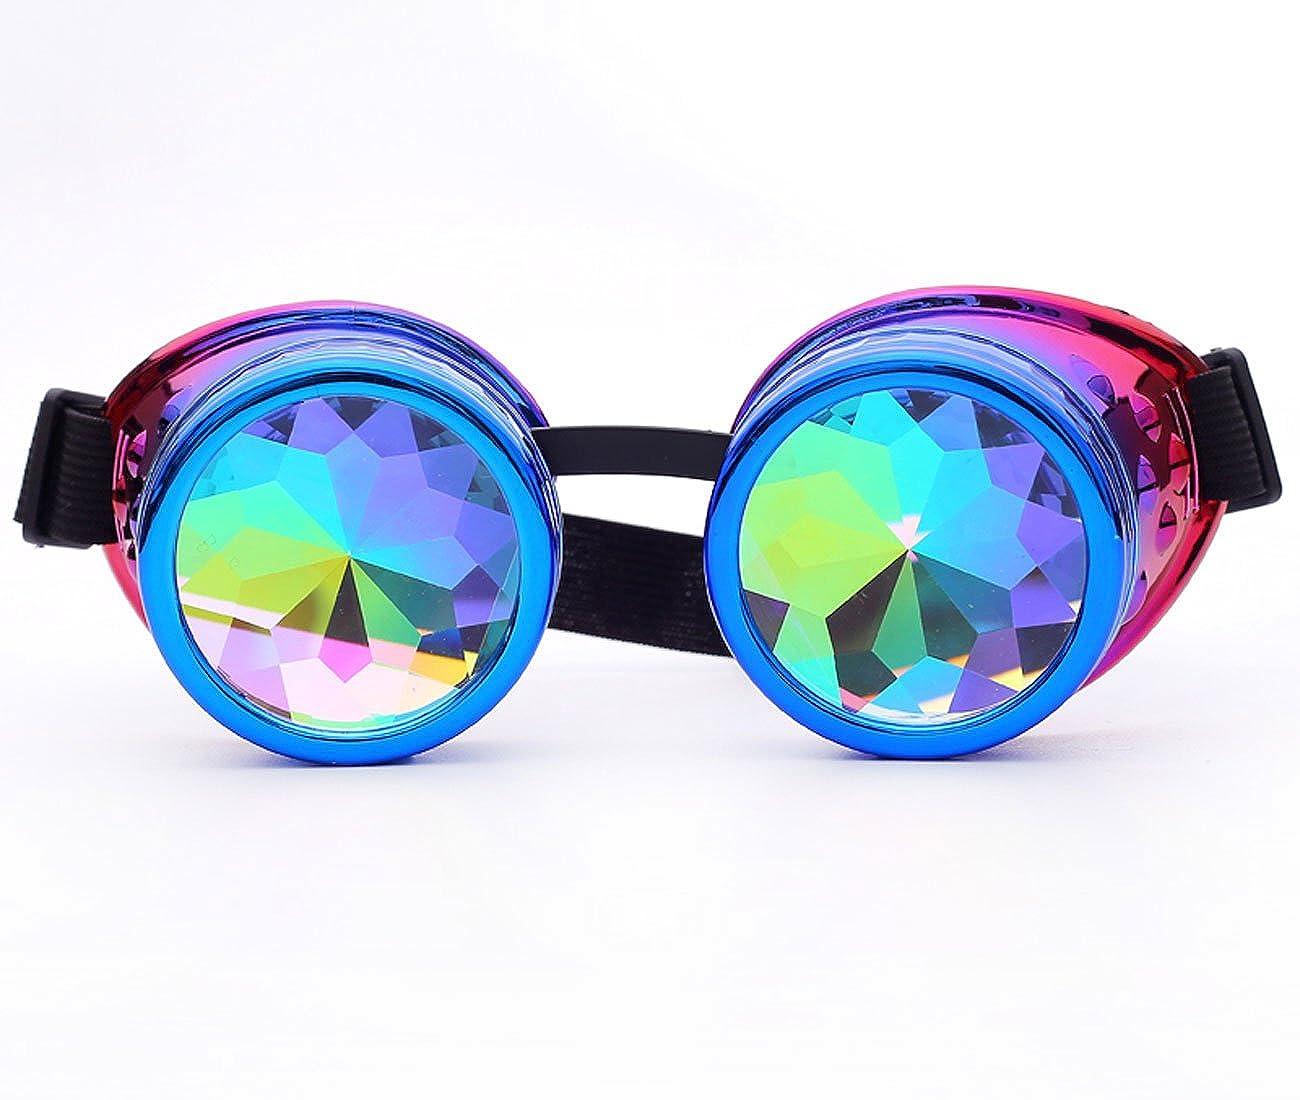 ZAIQUN Goggles Kaleidoscope Steampunk Rave Glasses with Crystal Glass Lens ZQ@MG005-V-CN-WLJ01